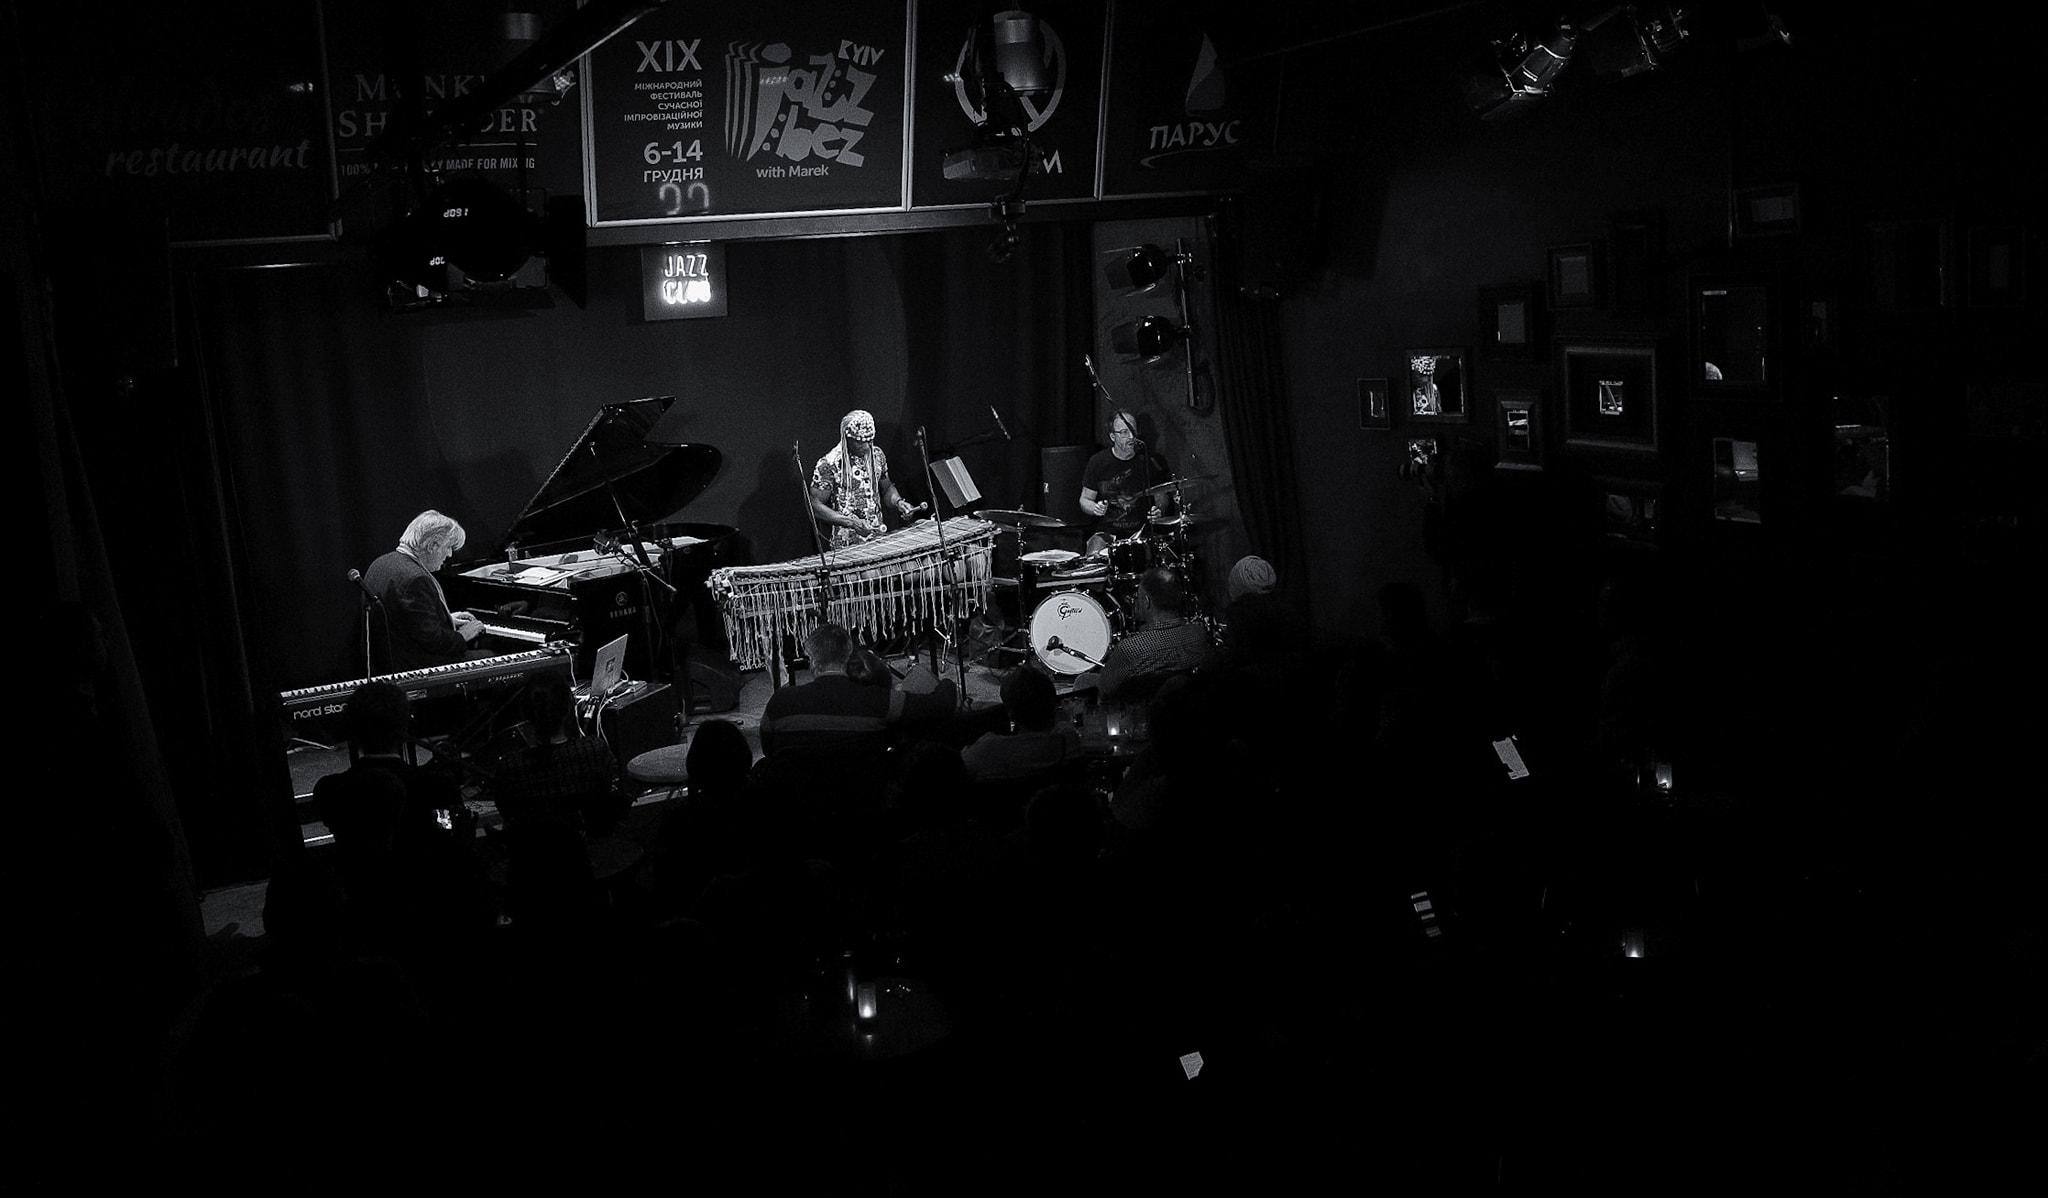 06/12 Hans Ludemann & Trio Ivoire. Фото: Андрій Олифіренко